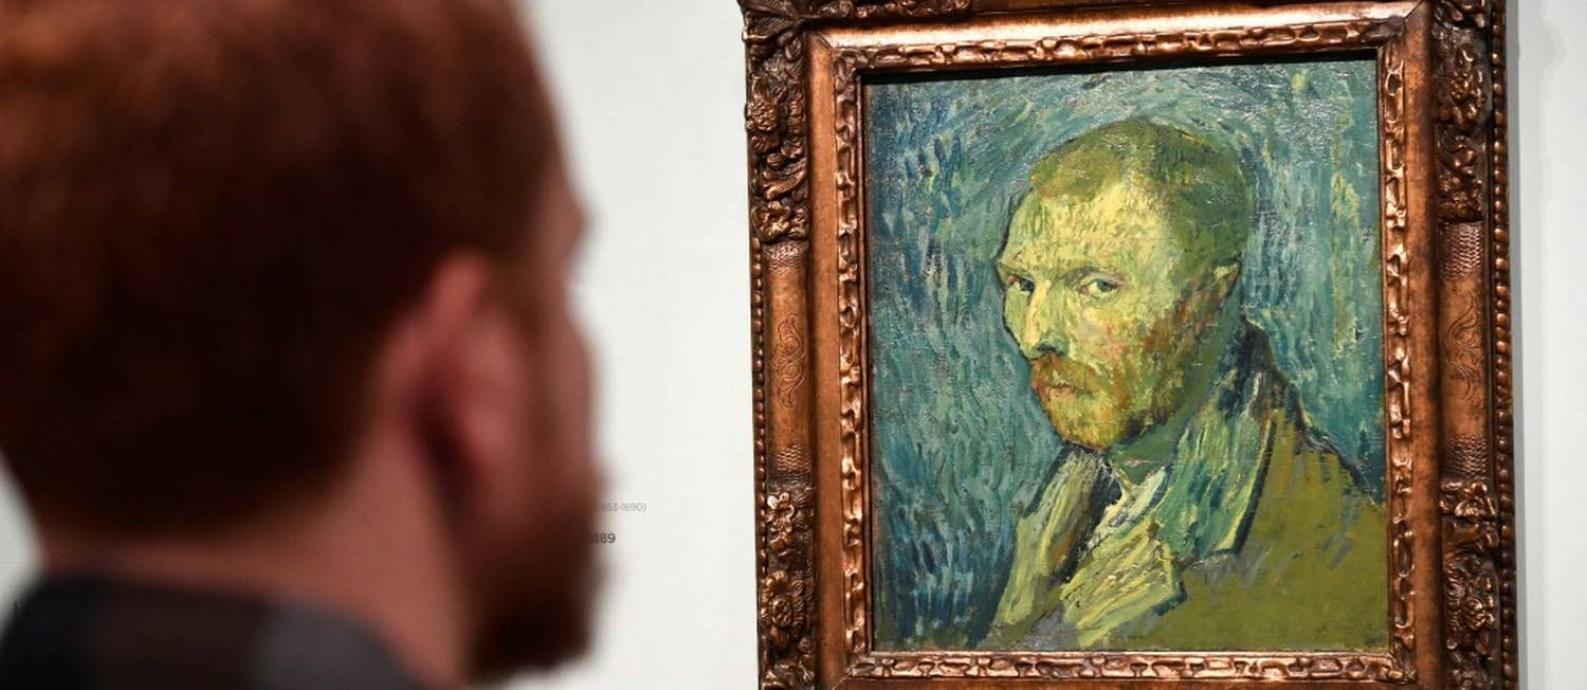 A pintura de Vangh Gogh foi feita durante surto psicótico Foto: PIROSCHKA VAN DE WOUW / REUTERS